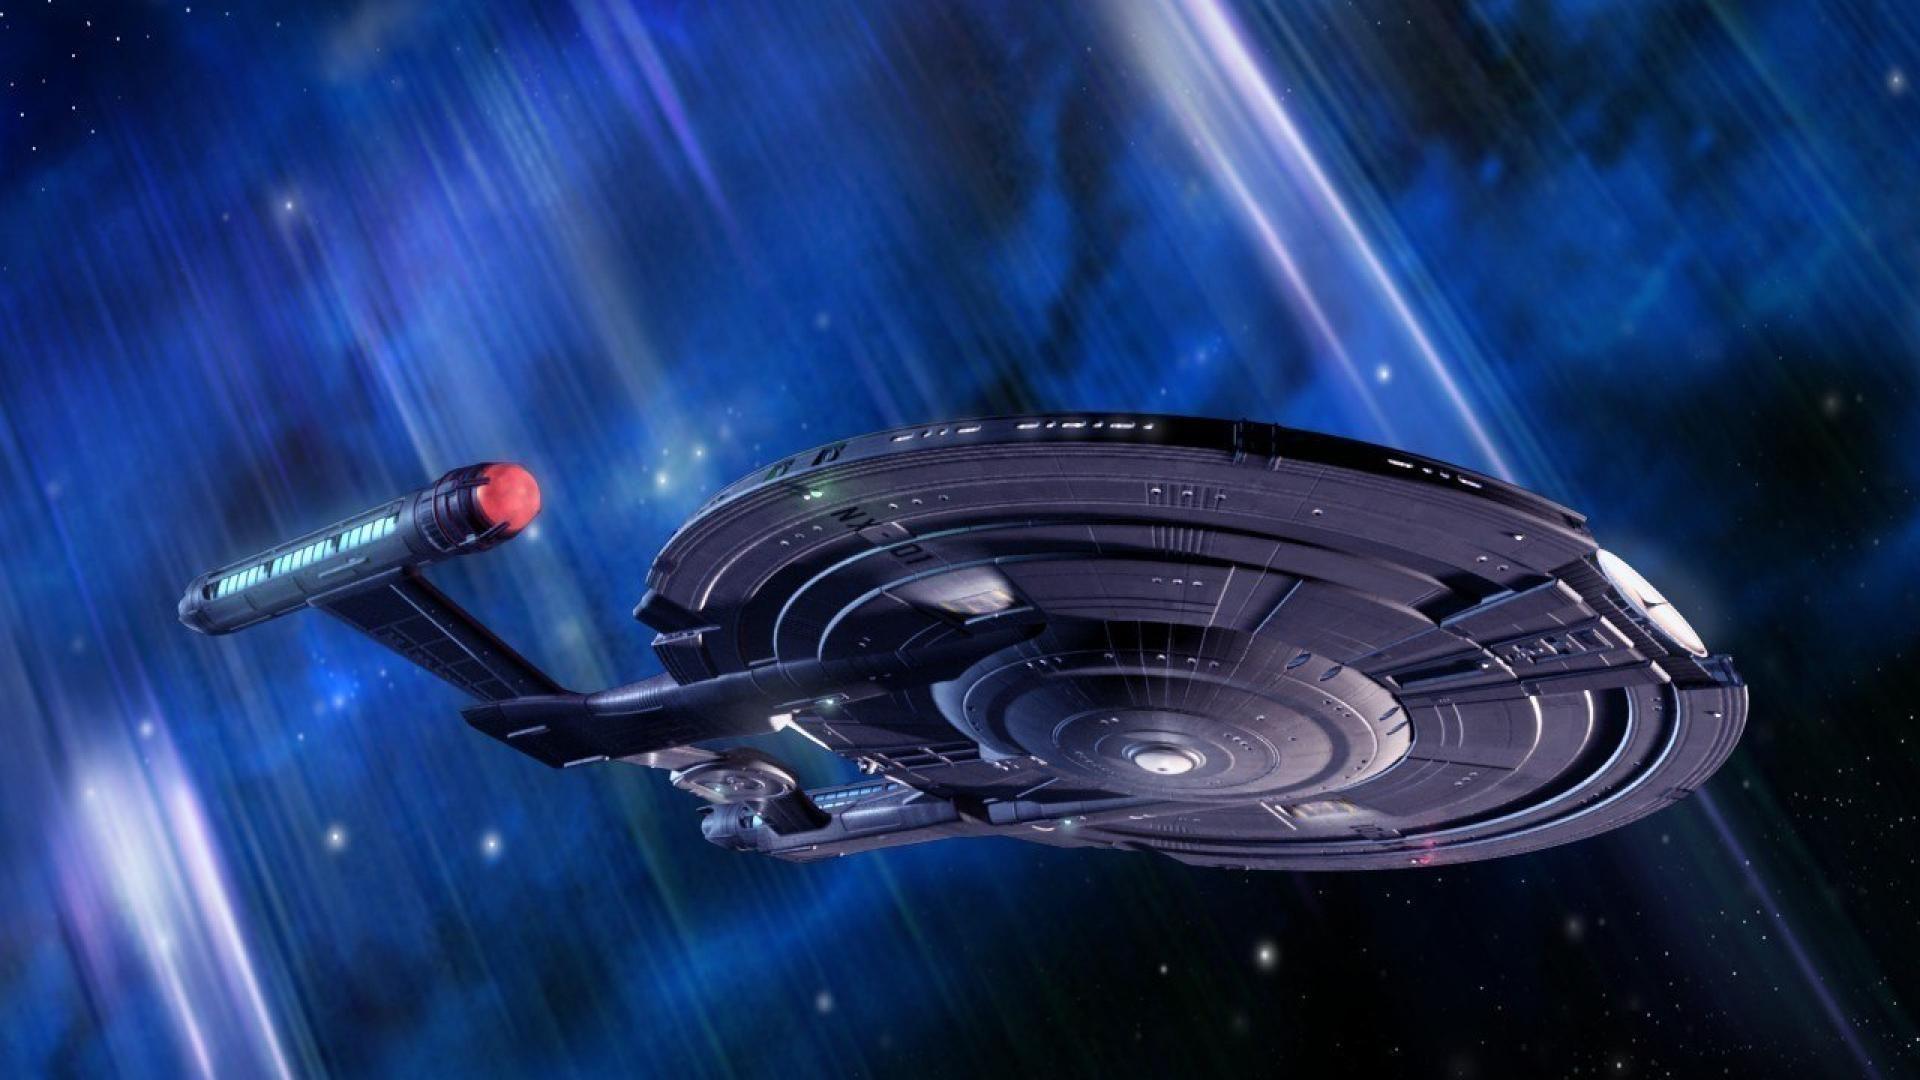 Star Trek Enterprise Spaceship Space Ship Stars Movie Hd